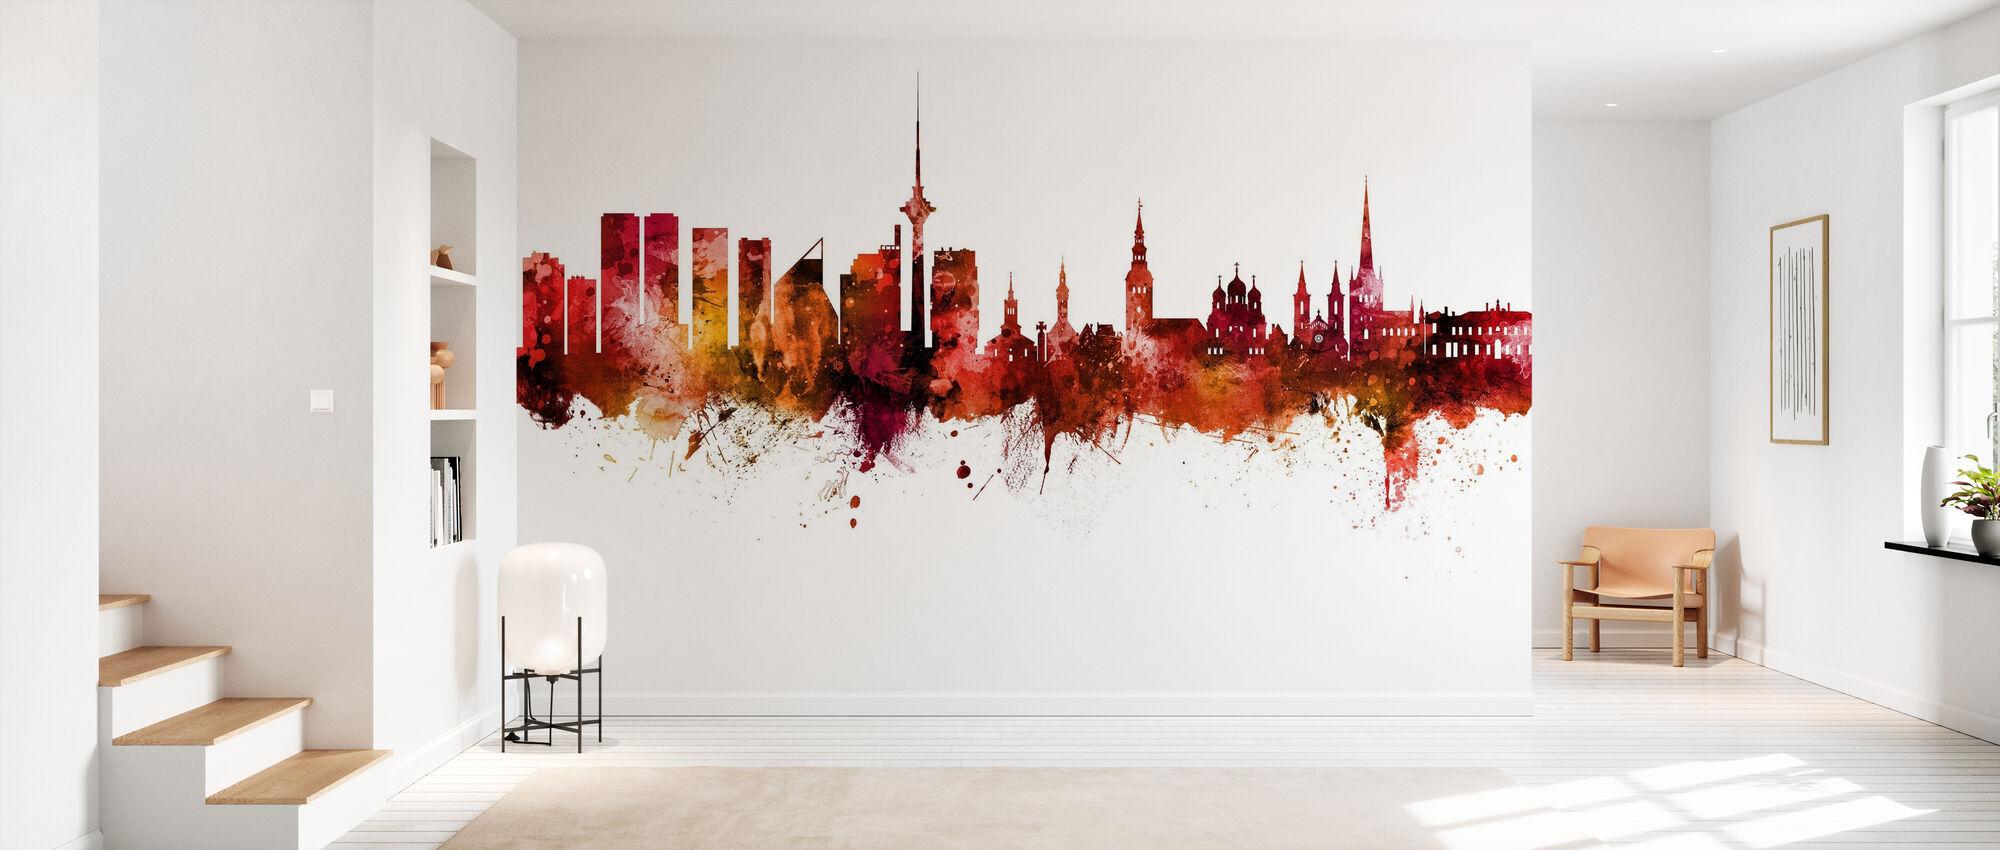 Tallinn Estonia Skyline - Wallpaper - Hallway